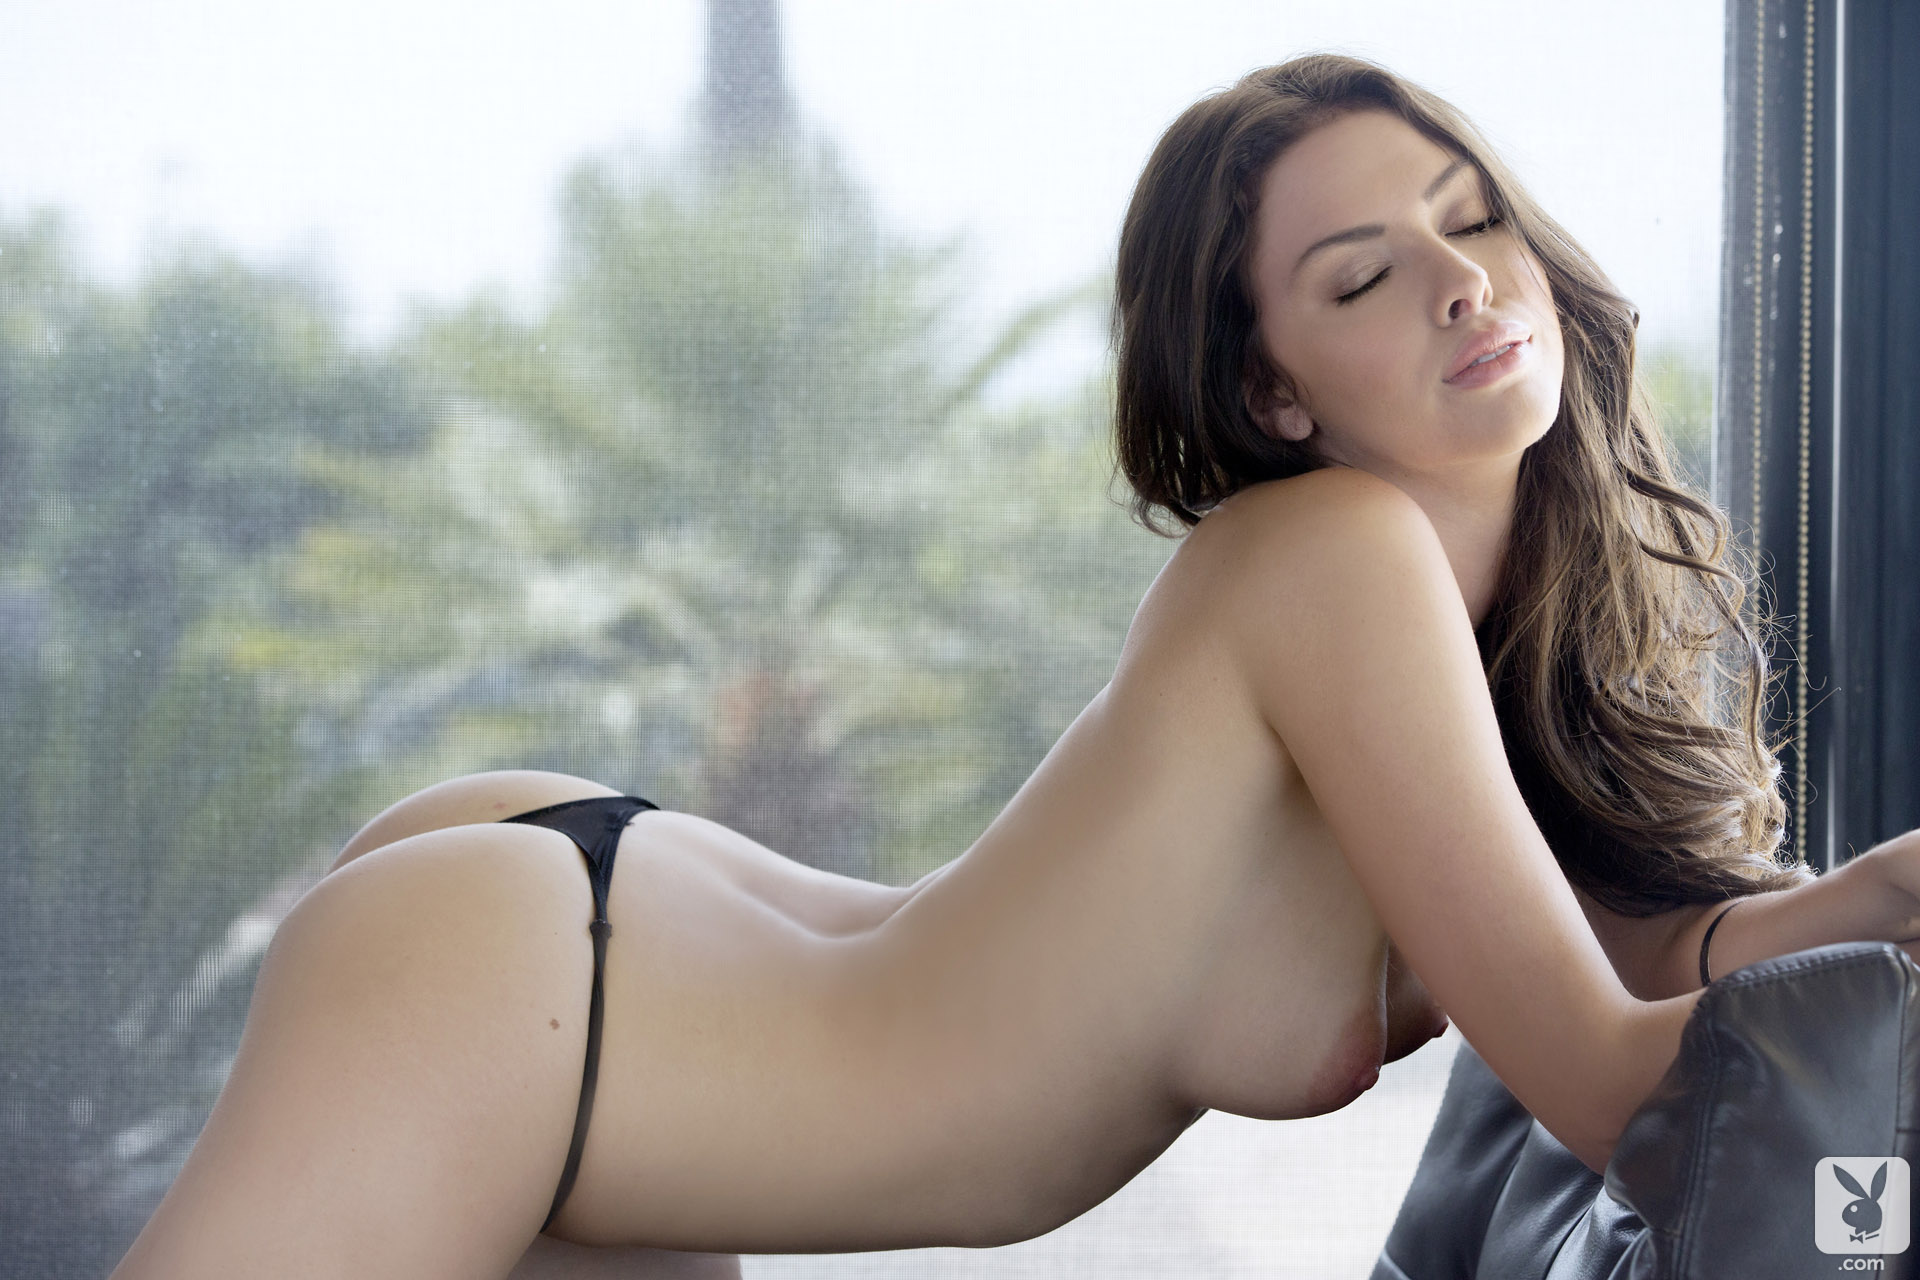 Playboy Amateur Girls Daftsex